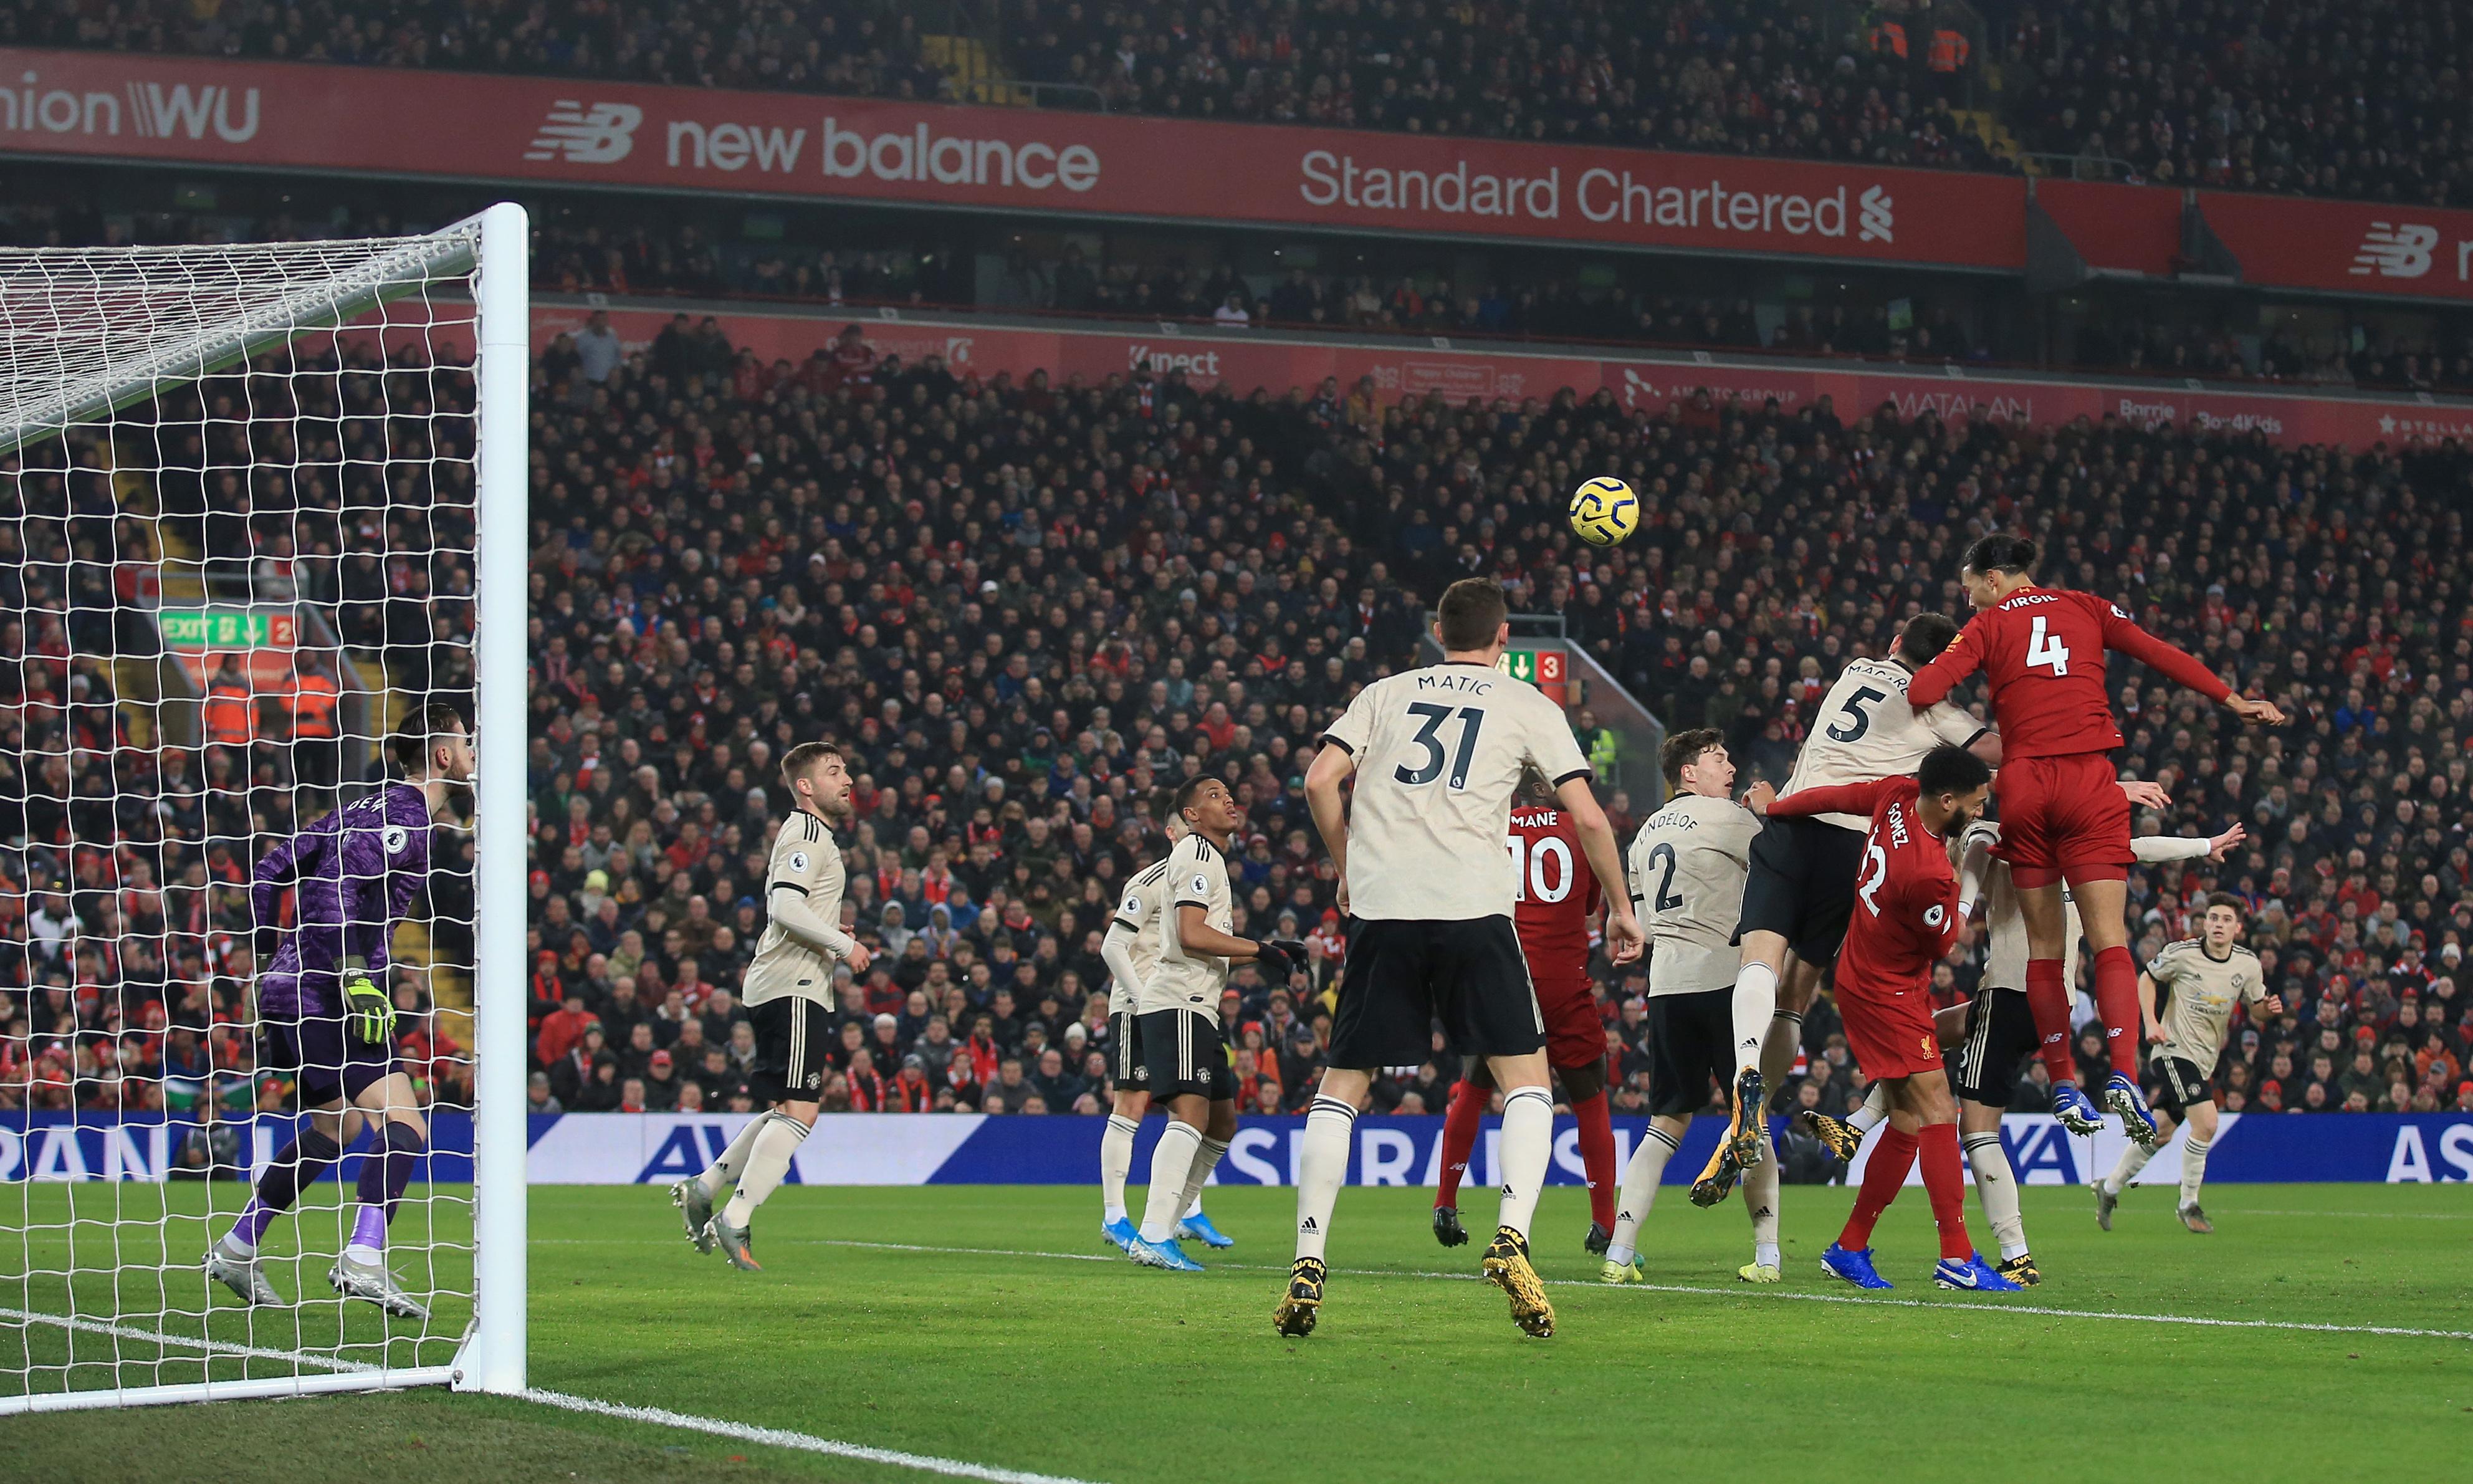 Van Dijk and Salah incisions help Liverpool tear open Manchester United